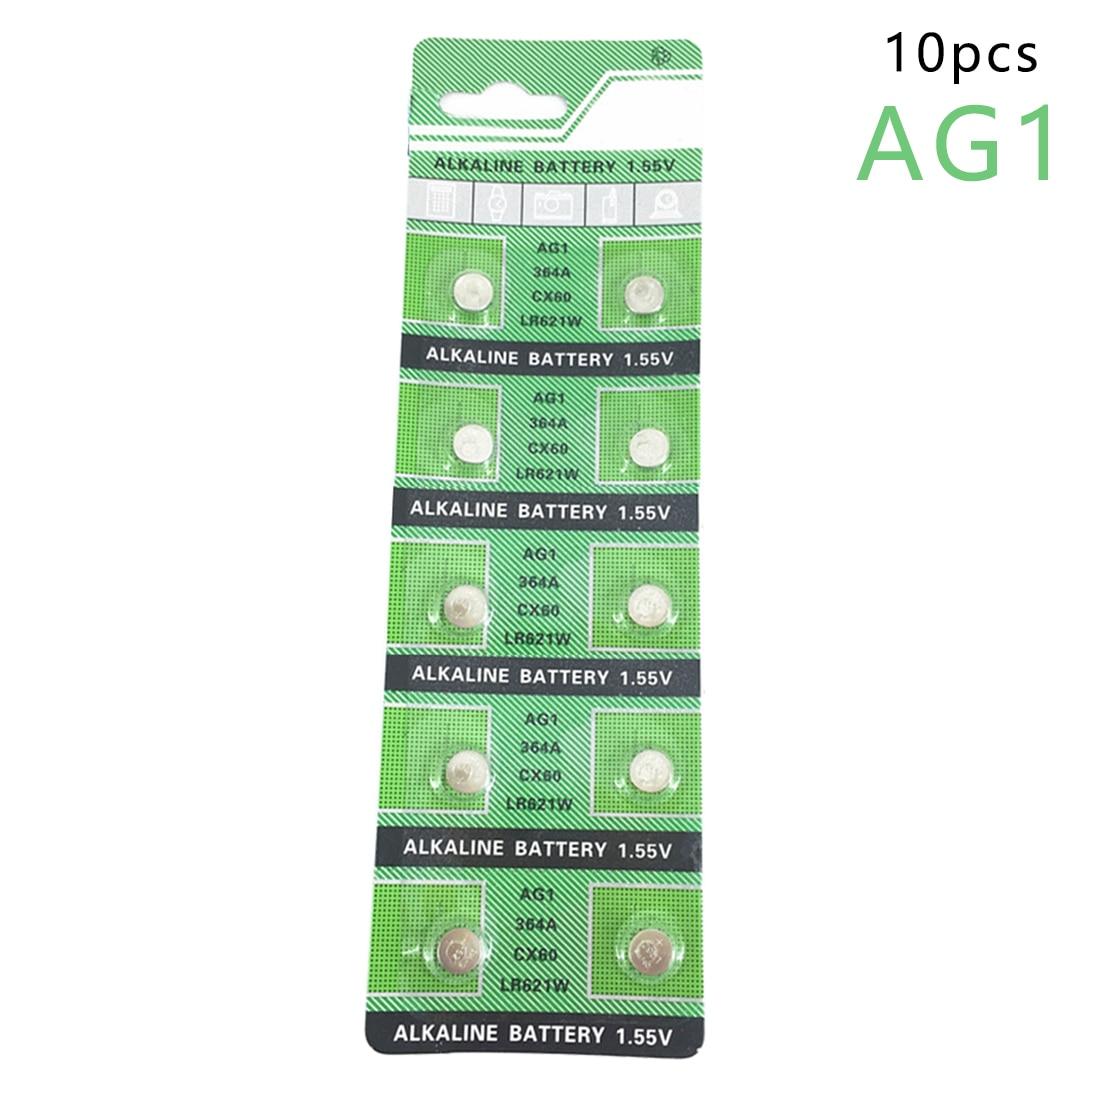 centechia Pro Button Battery AG1 364 SR621 SR60 SR60L Alkaline Coin Cell Button Batteries For Watch x10 1.55V EE6202 цена 2017